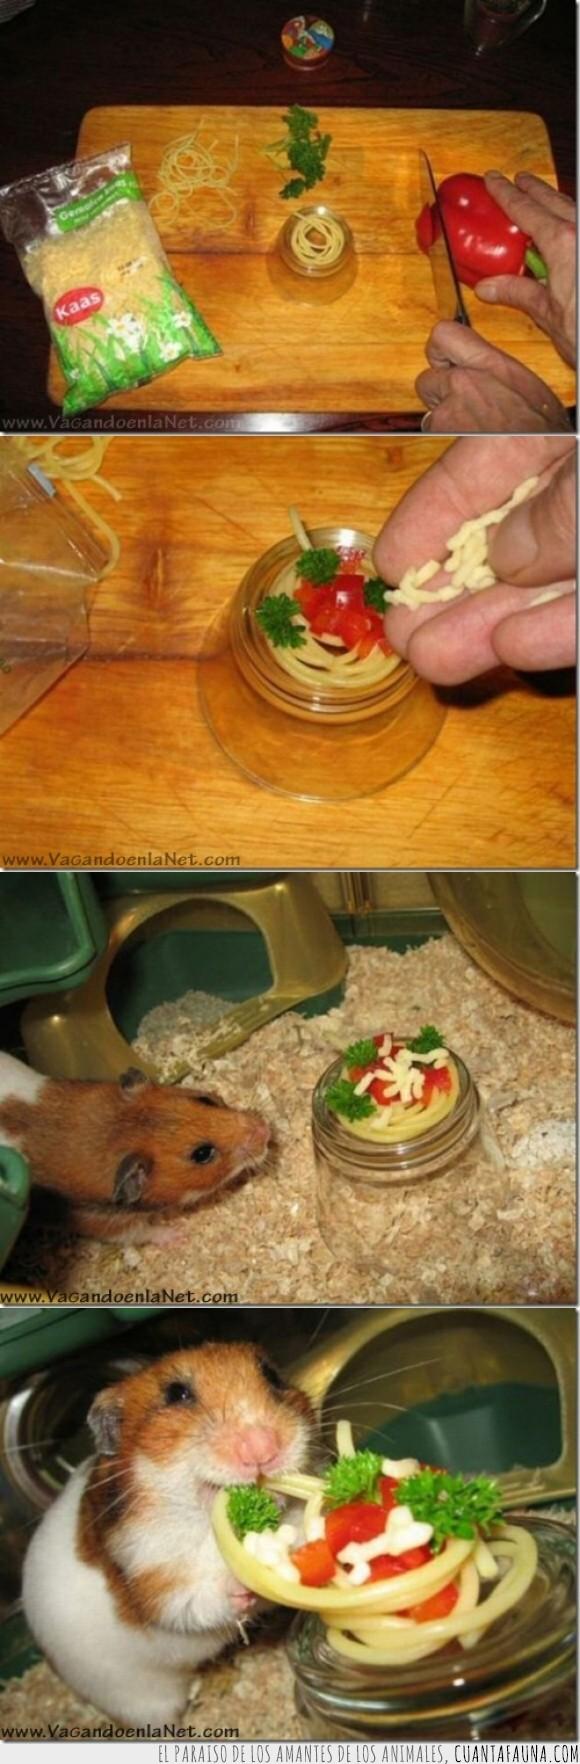 amistad,consentir,espagueti,hamster,mascota,pasta,plato,regalo